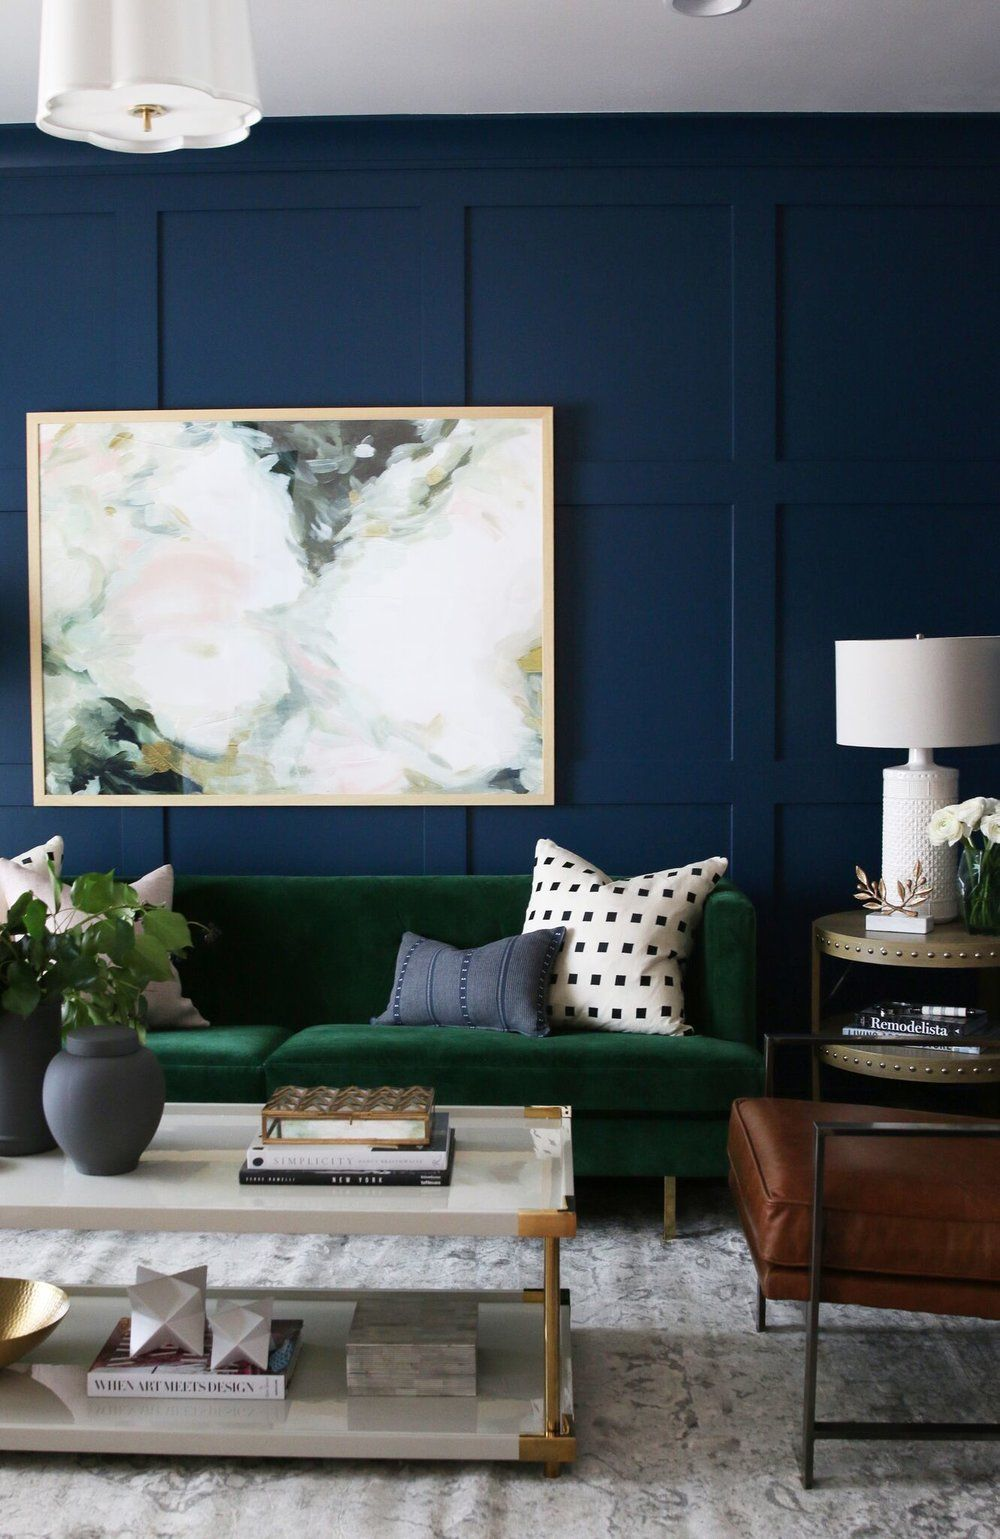 Formal Sitting Room Webisode | Studio mcgee, Sitting rooms and Formal